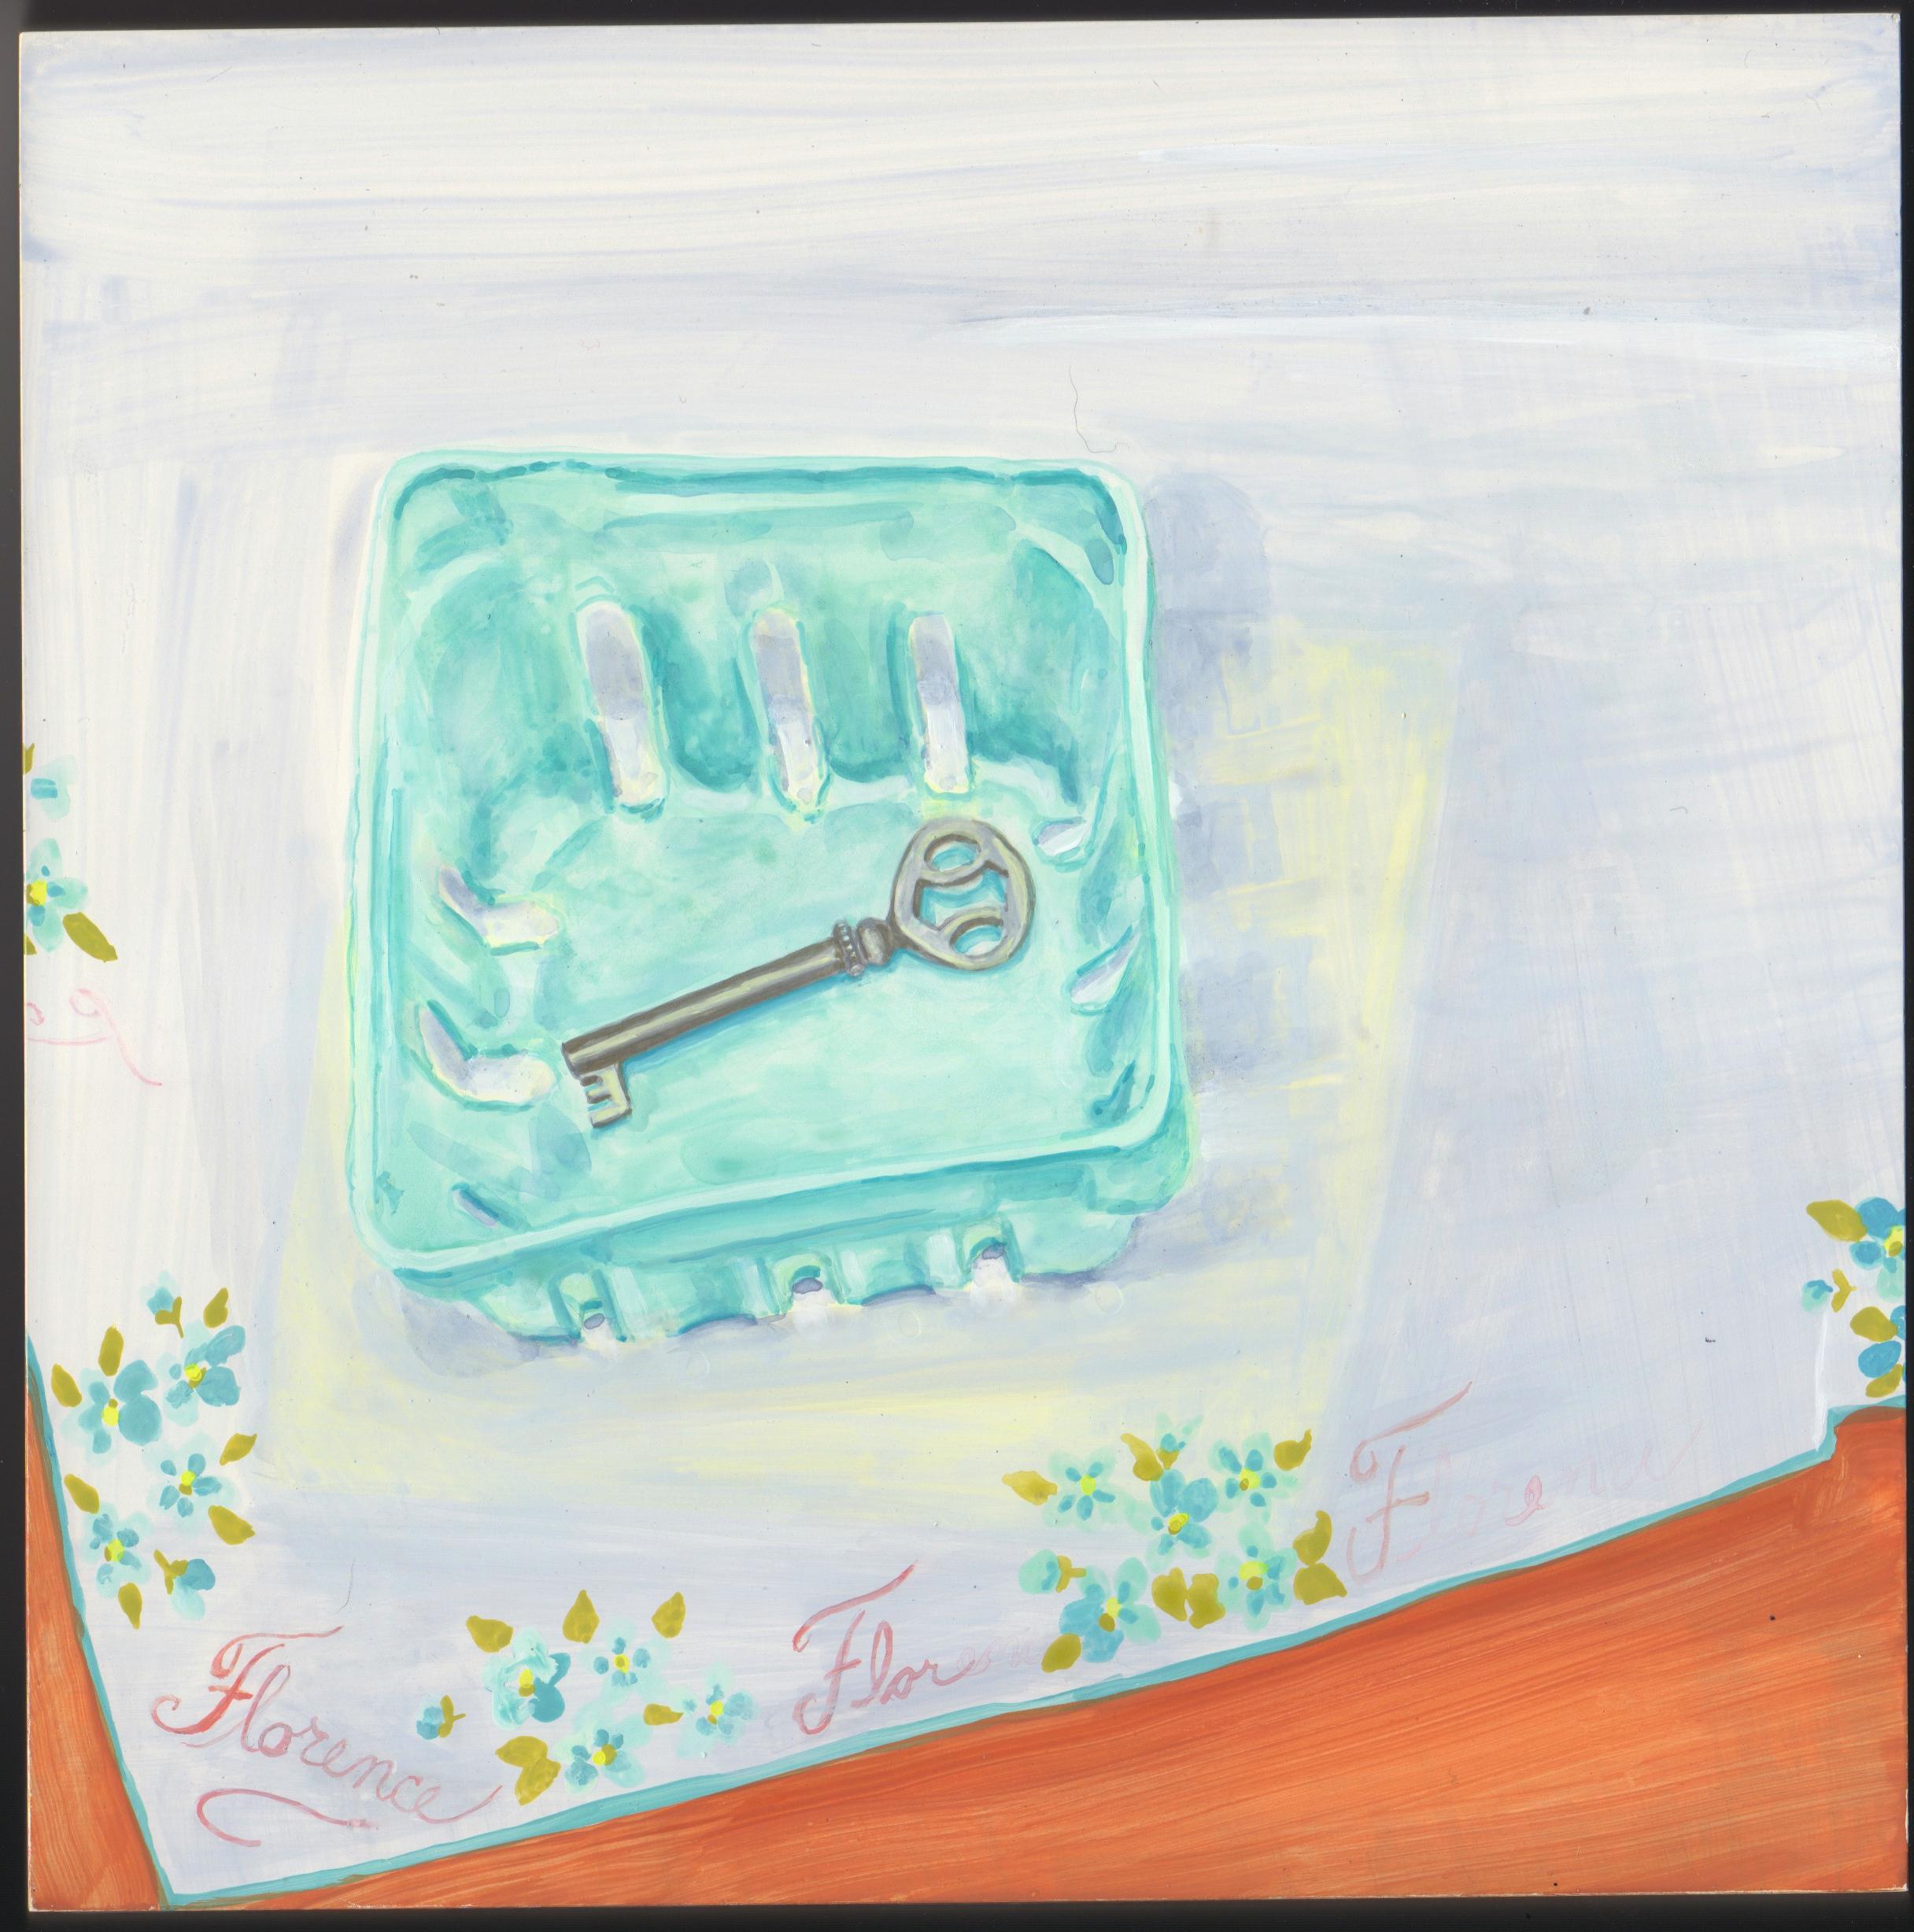 Flossie's Key